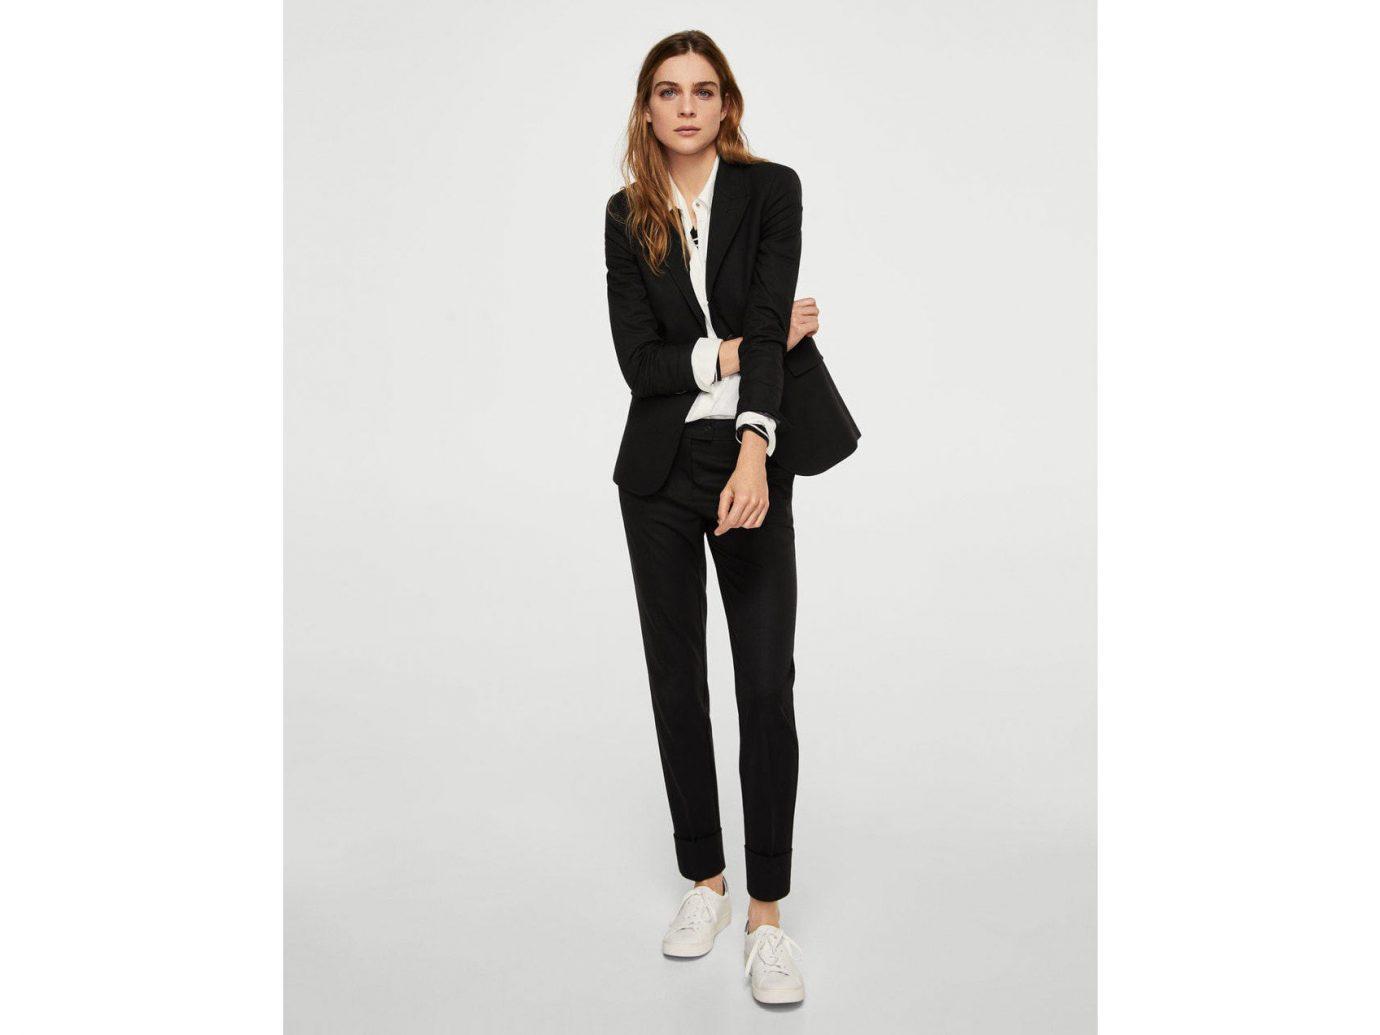 France Style + Design Travel Shop clothing standing woman suit posing fashion model person shoulder shoe formal wear outerwear jeans trousers joint blazer neck waist trouser dressed female